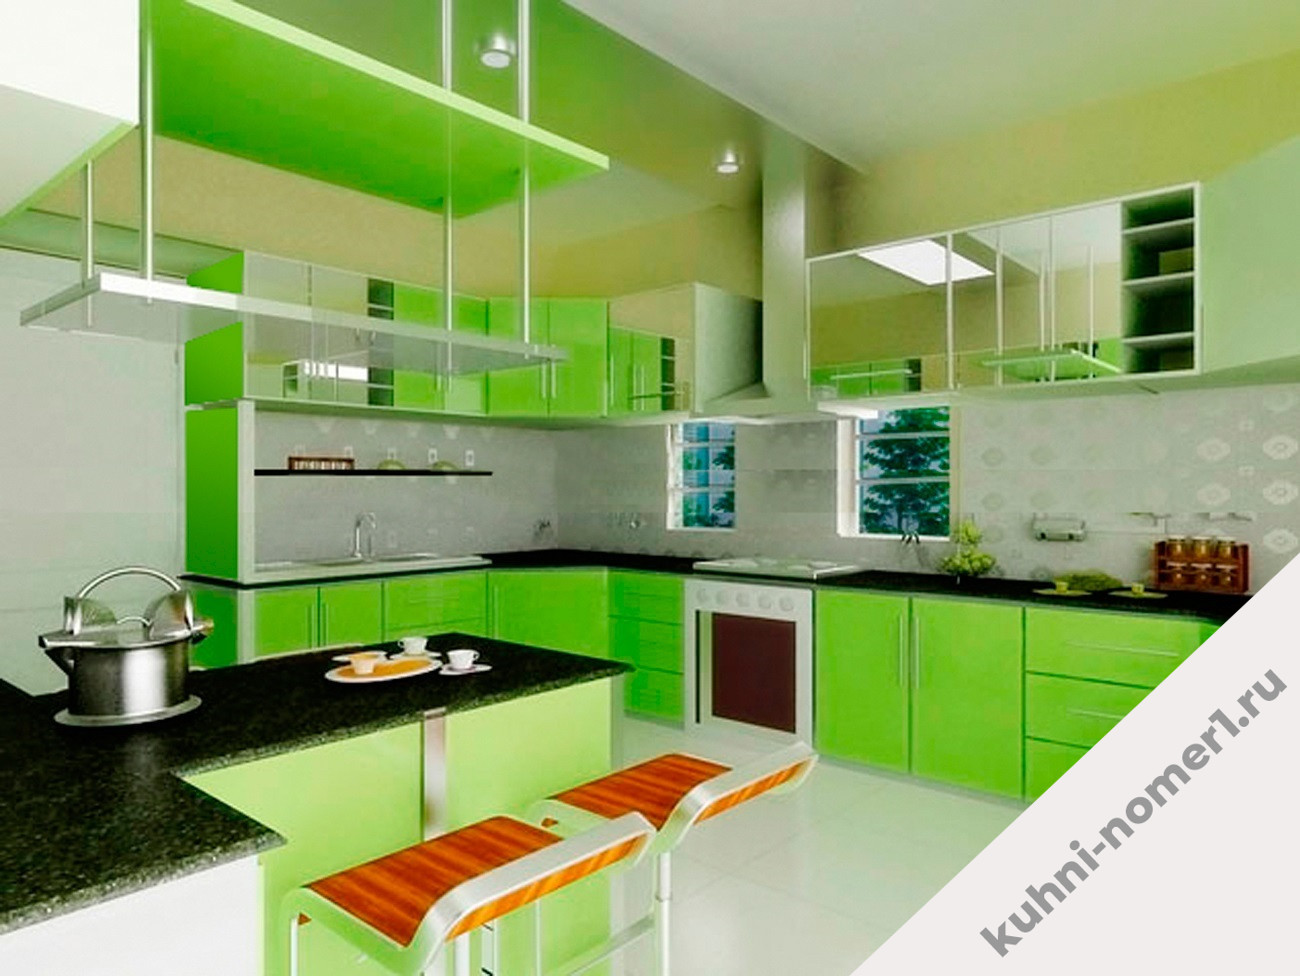 Идеи ремонта кухни своими руками